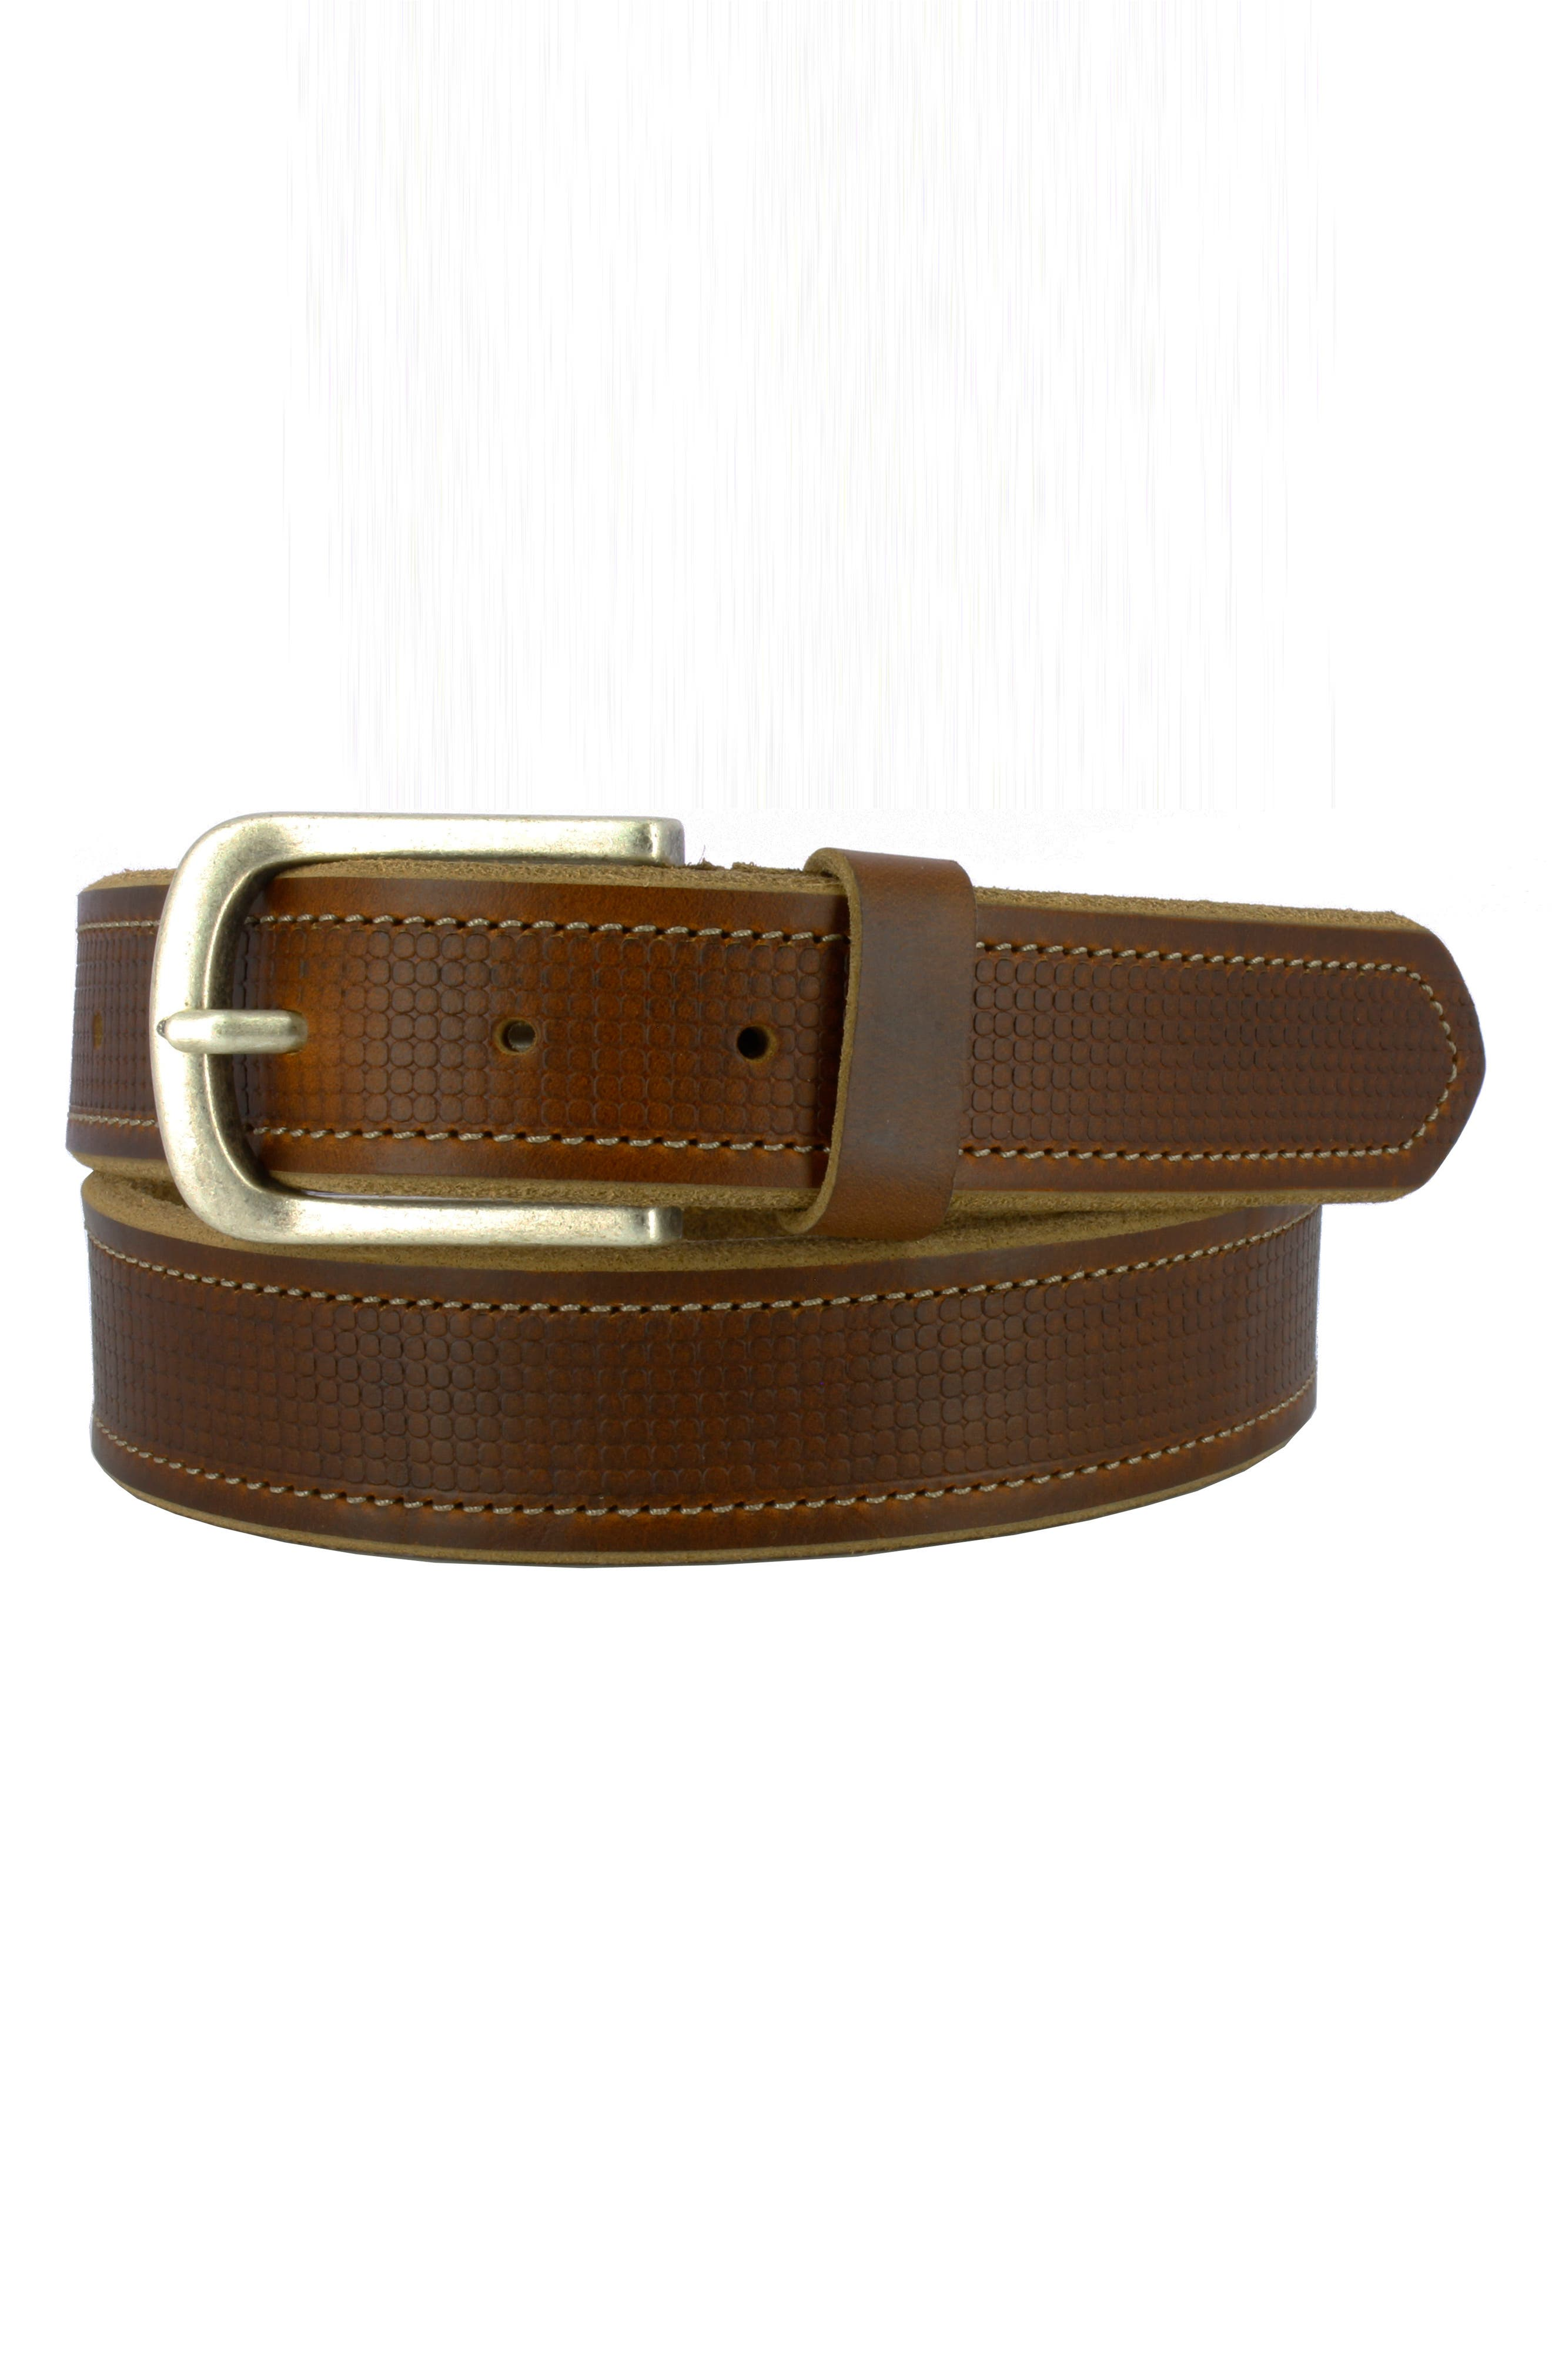 Remo Tulliani Sixx 2 Horween Leather Belt